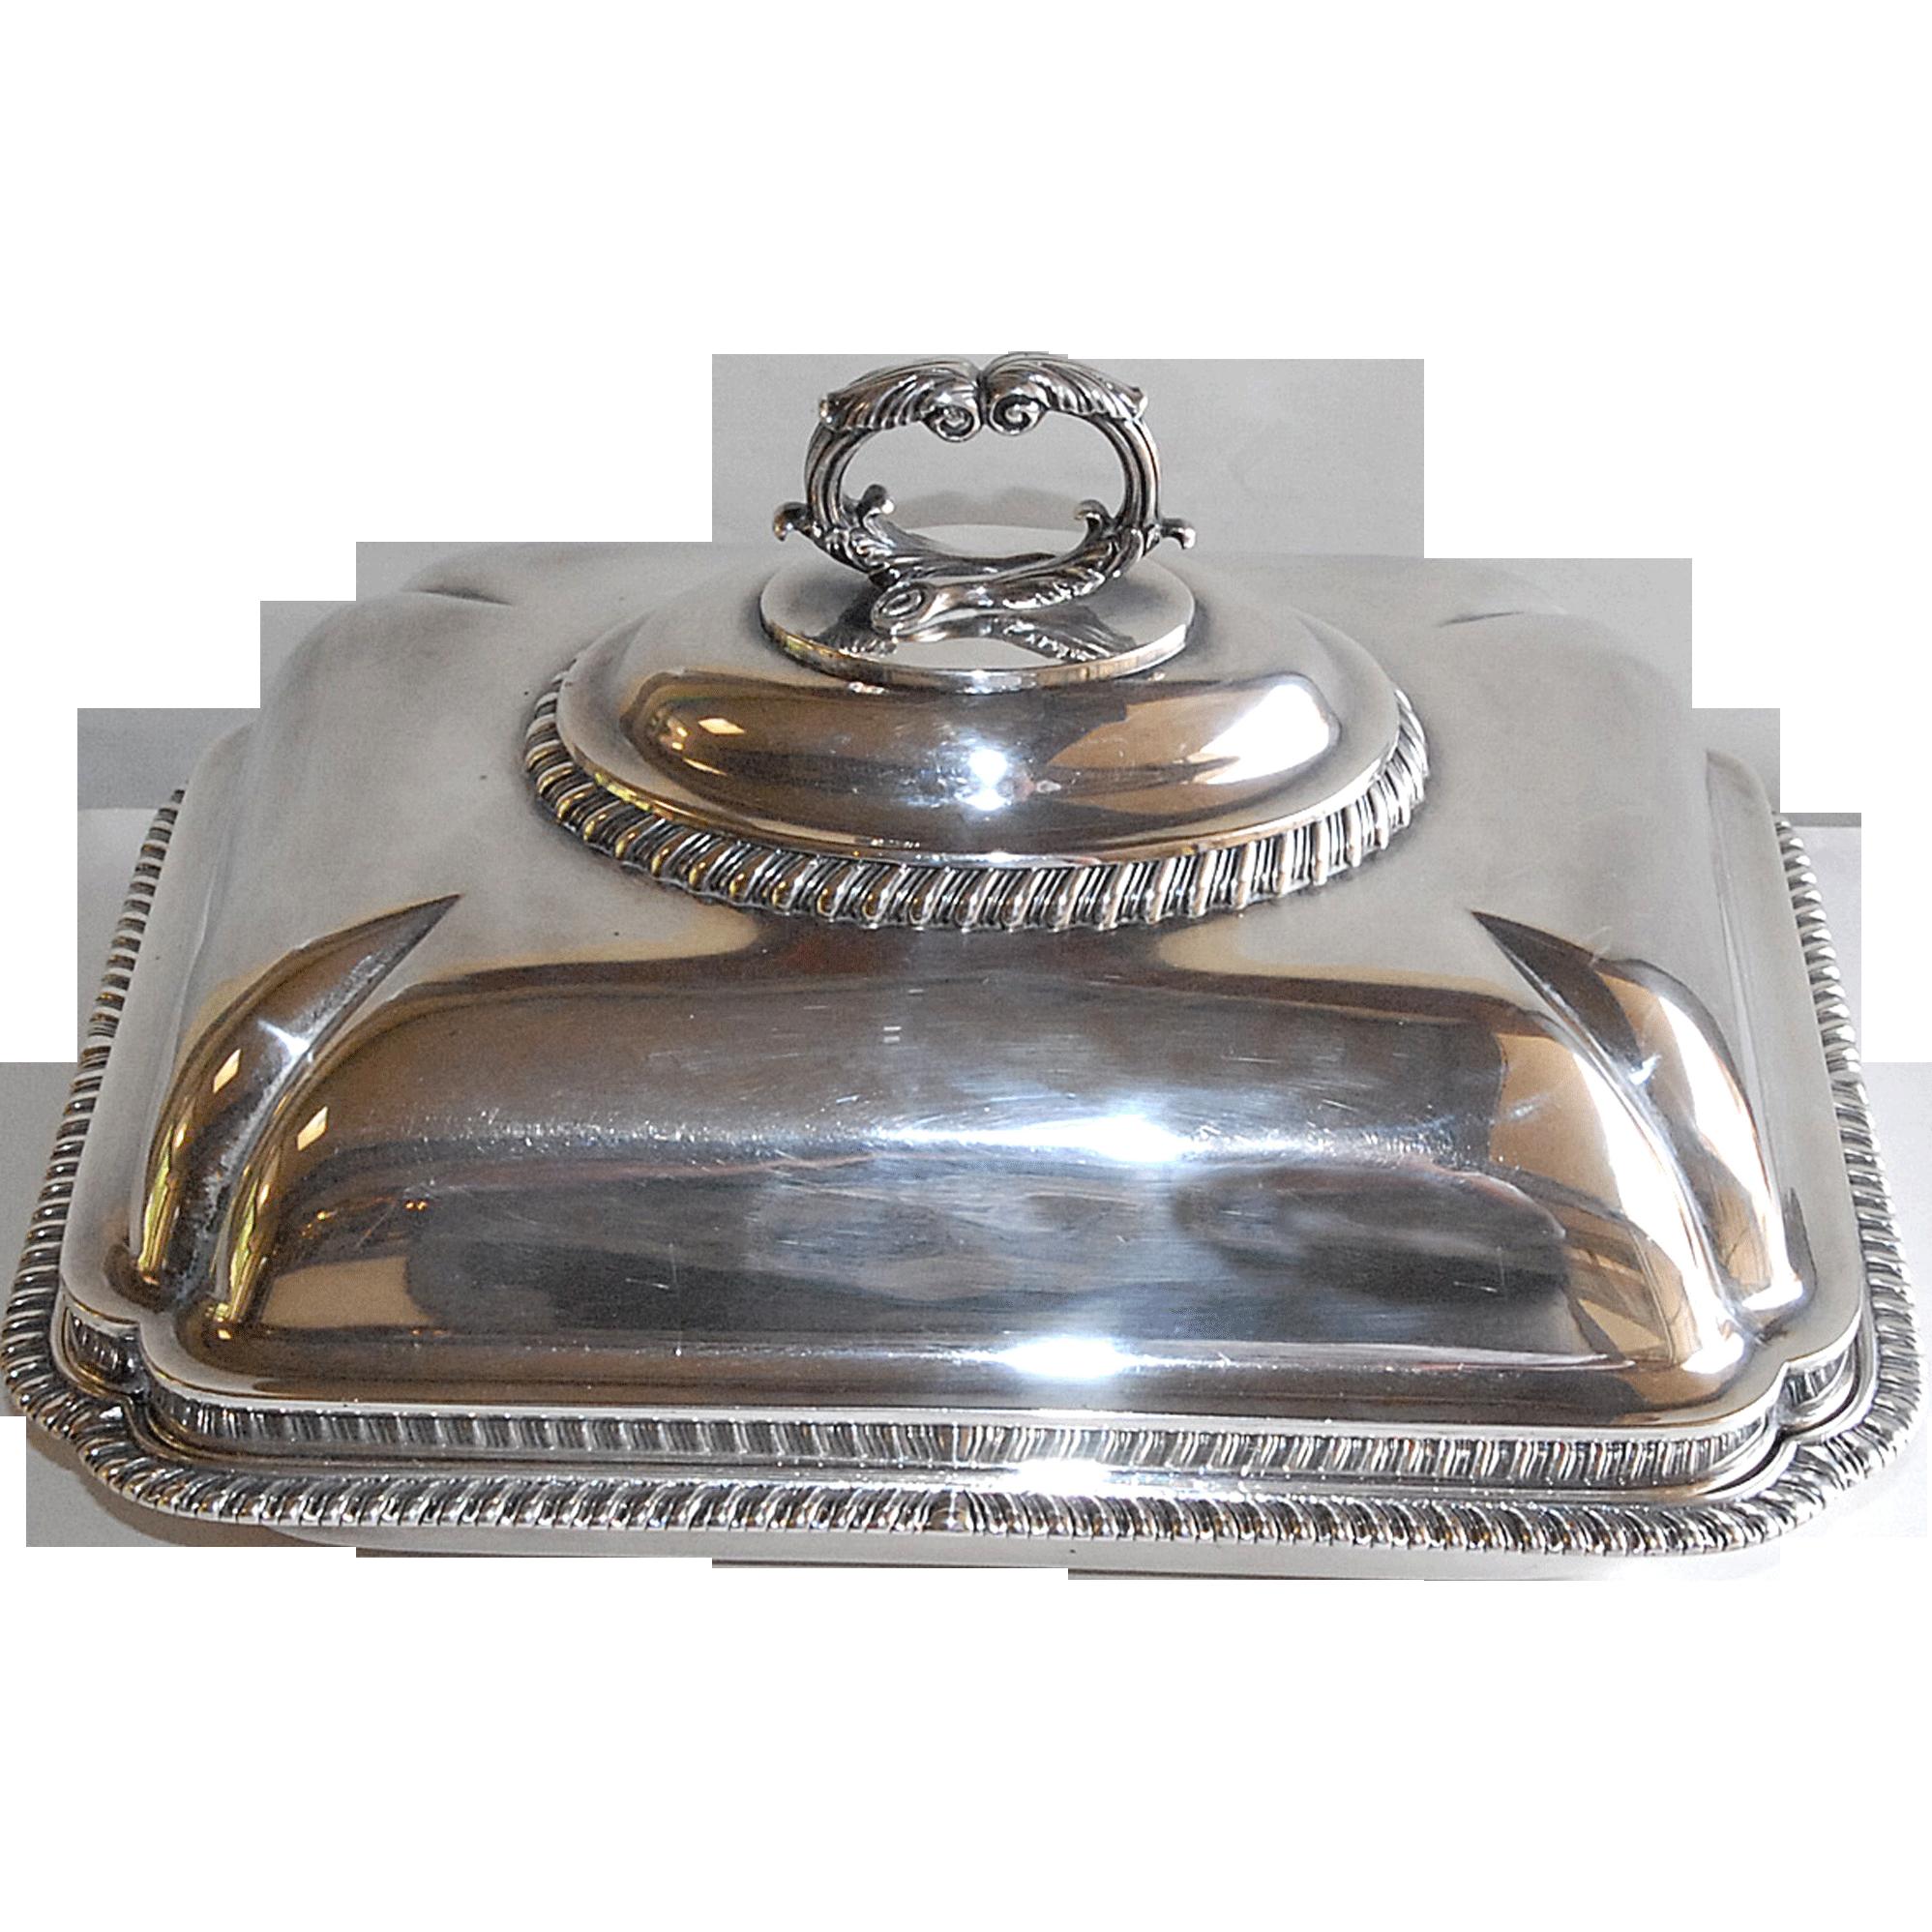 George III Sterling Covered Entree Dish by Robert Garrard